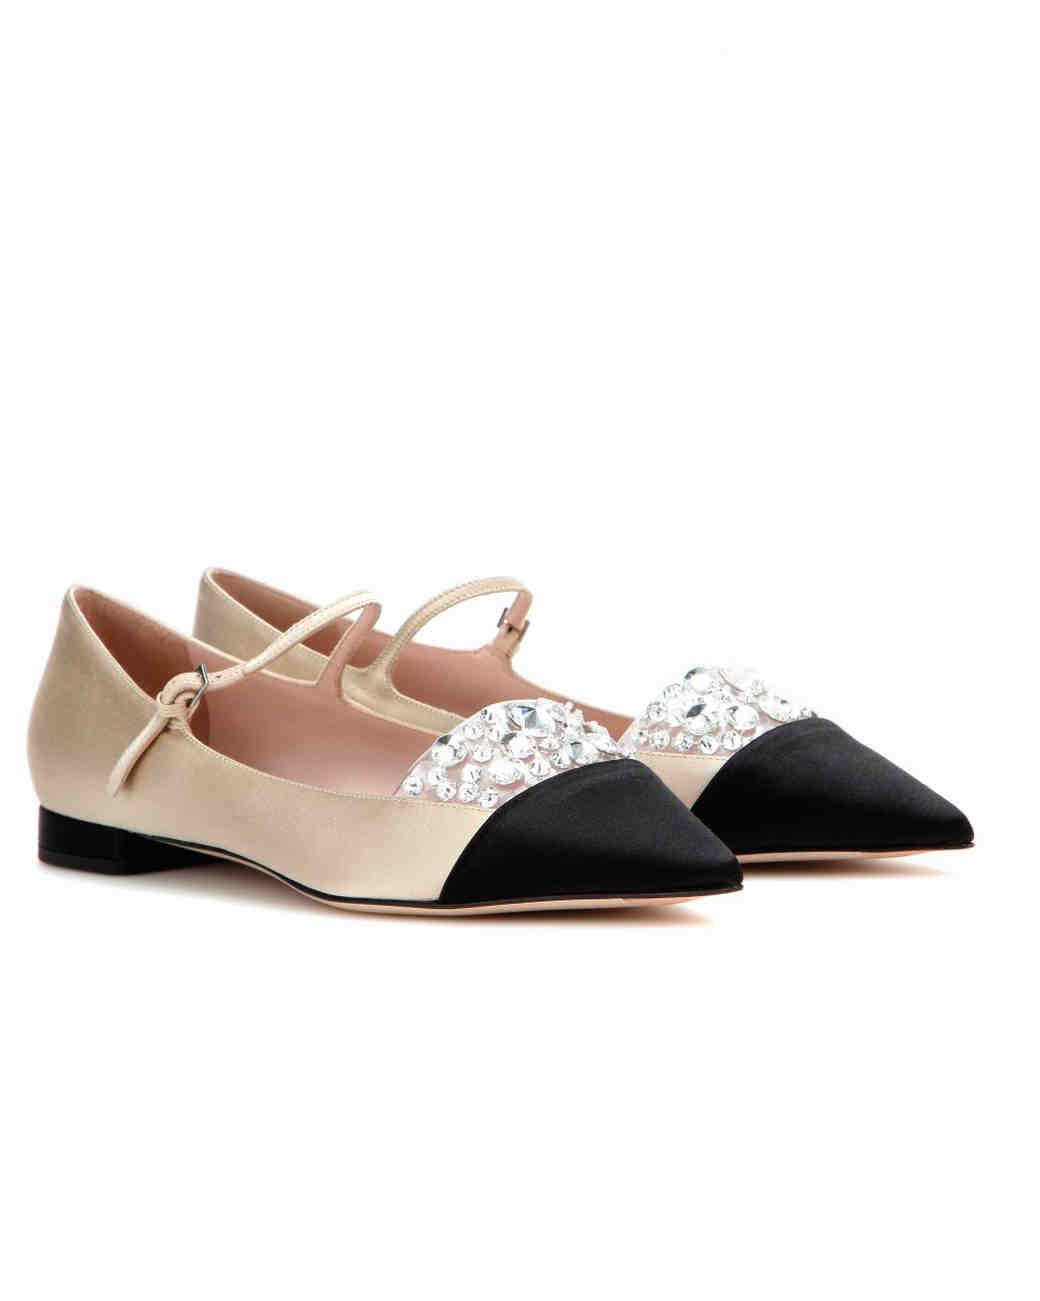 summer-wedding-shoes-miu-miu-satin-ballerinas-0515.jpg